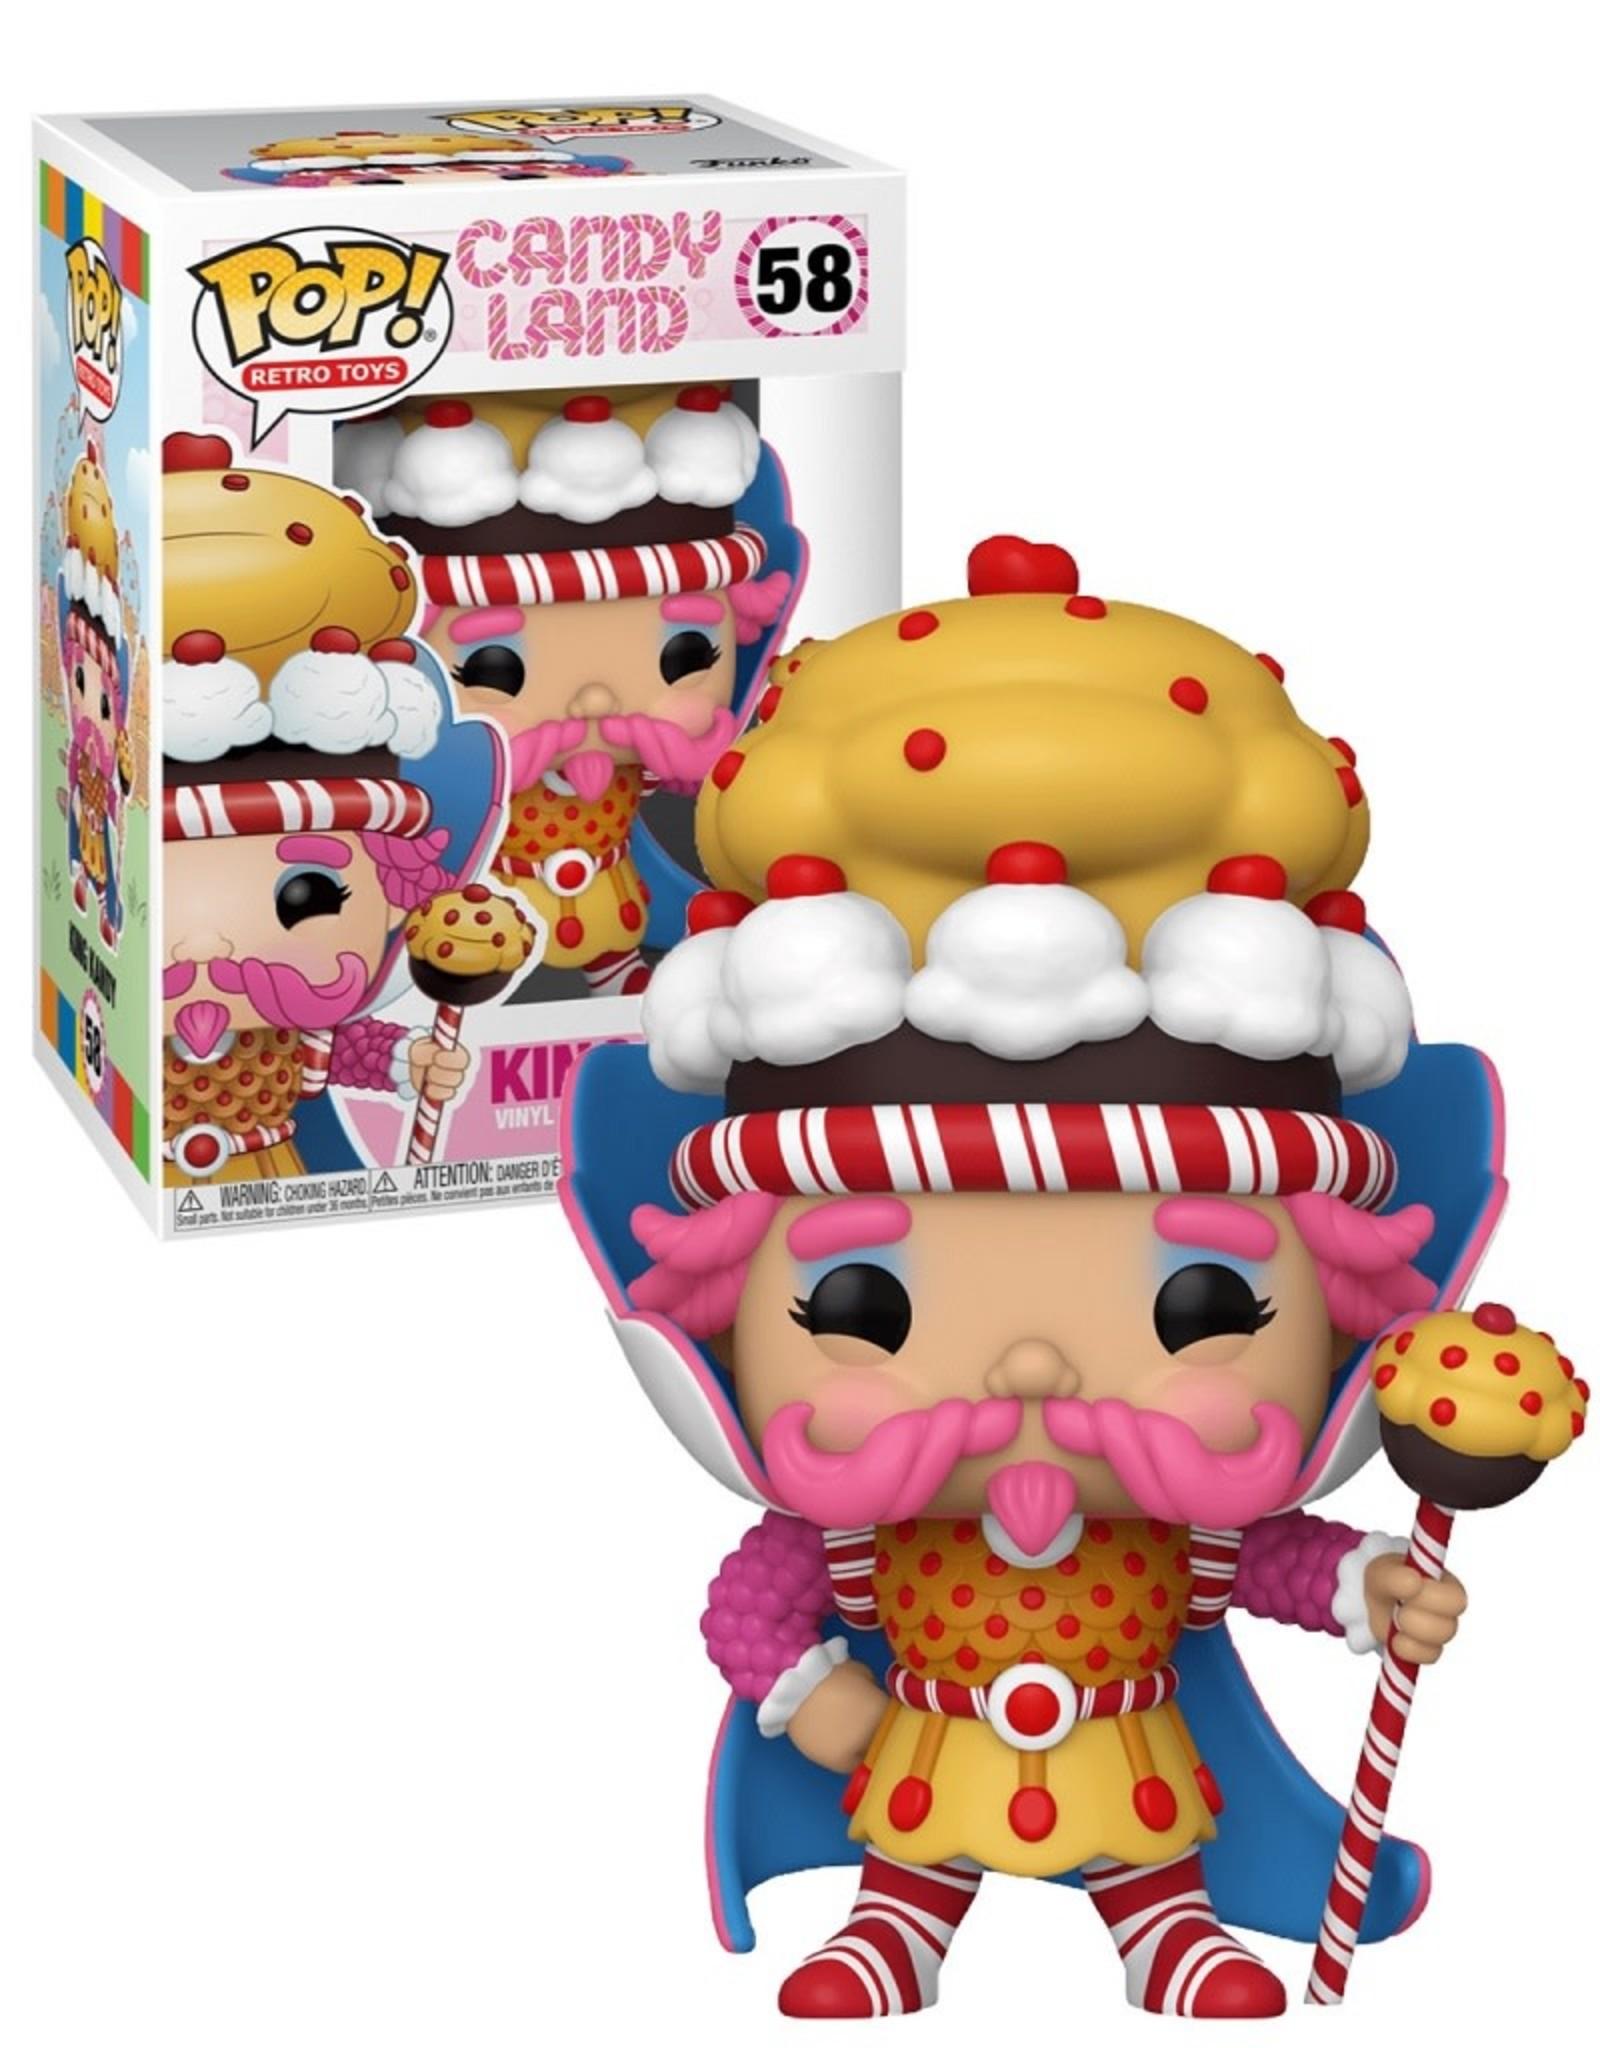 Candy Land 58 ( Funko Pop ) King Kandy